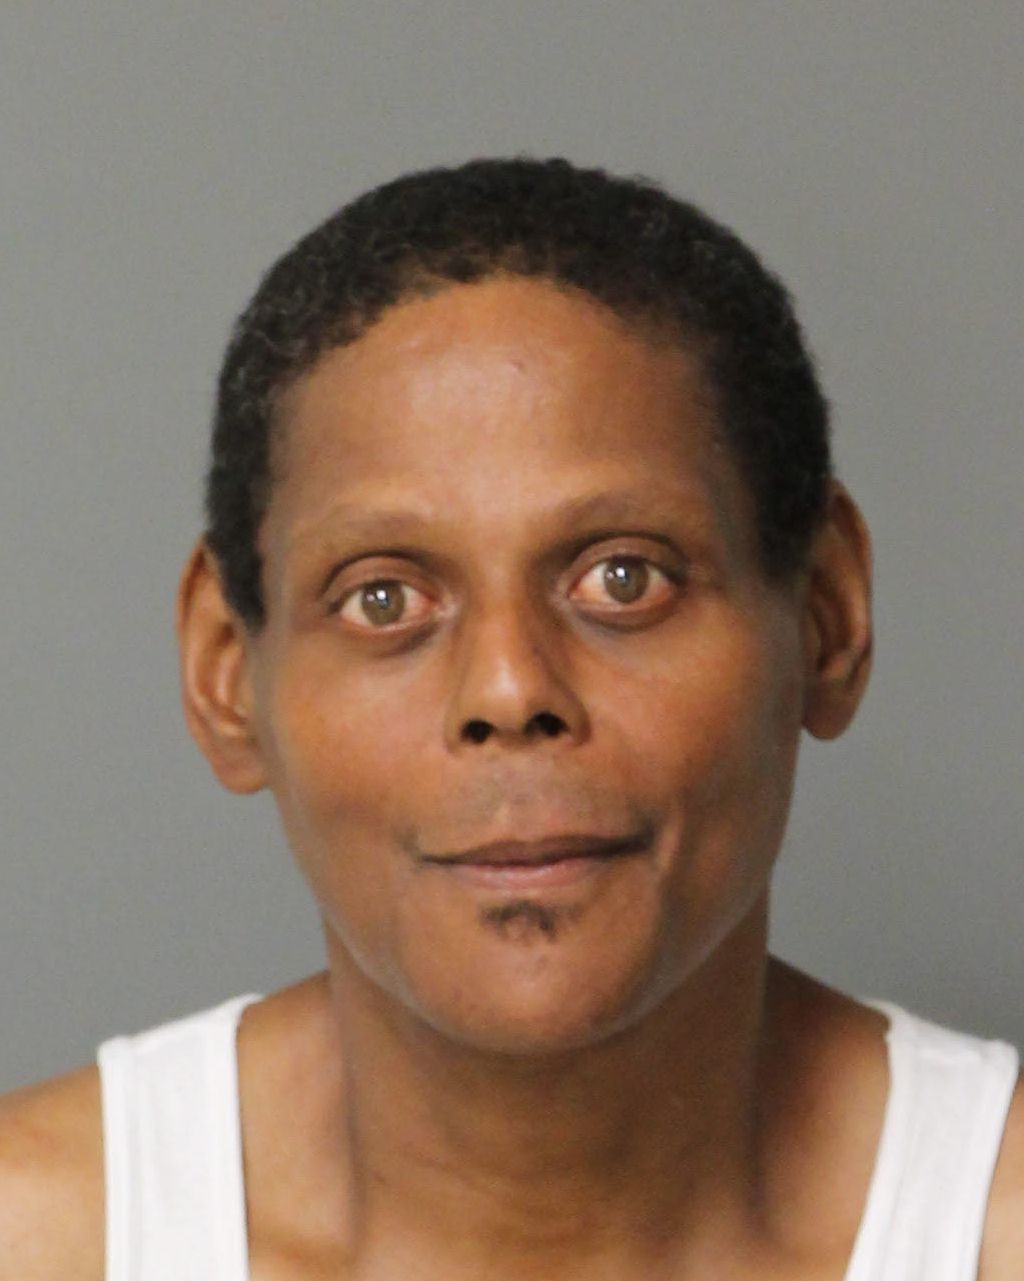 DAVIS CARLTON DONNELL Mugshot / County Arrests / Wake County Arrests